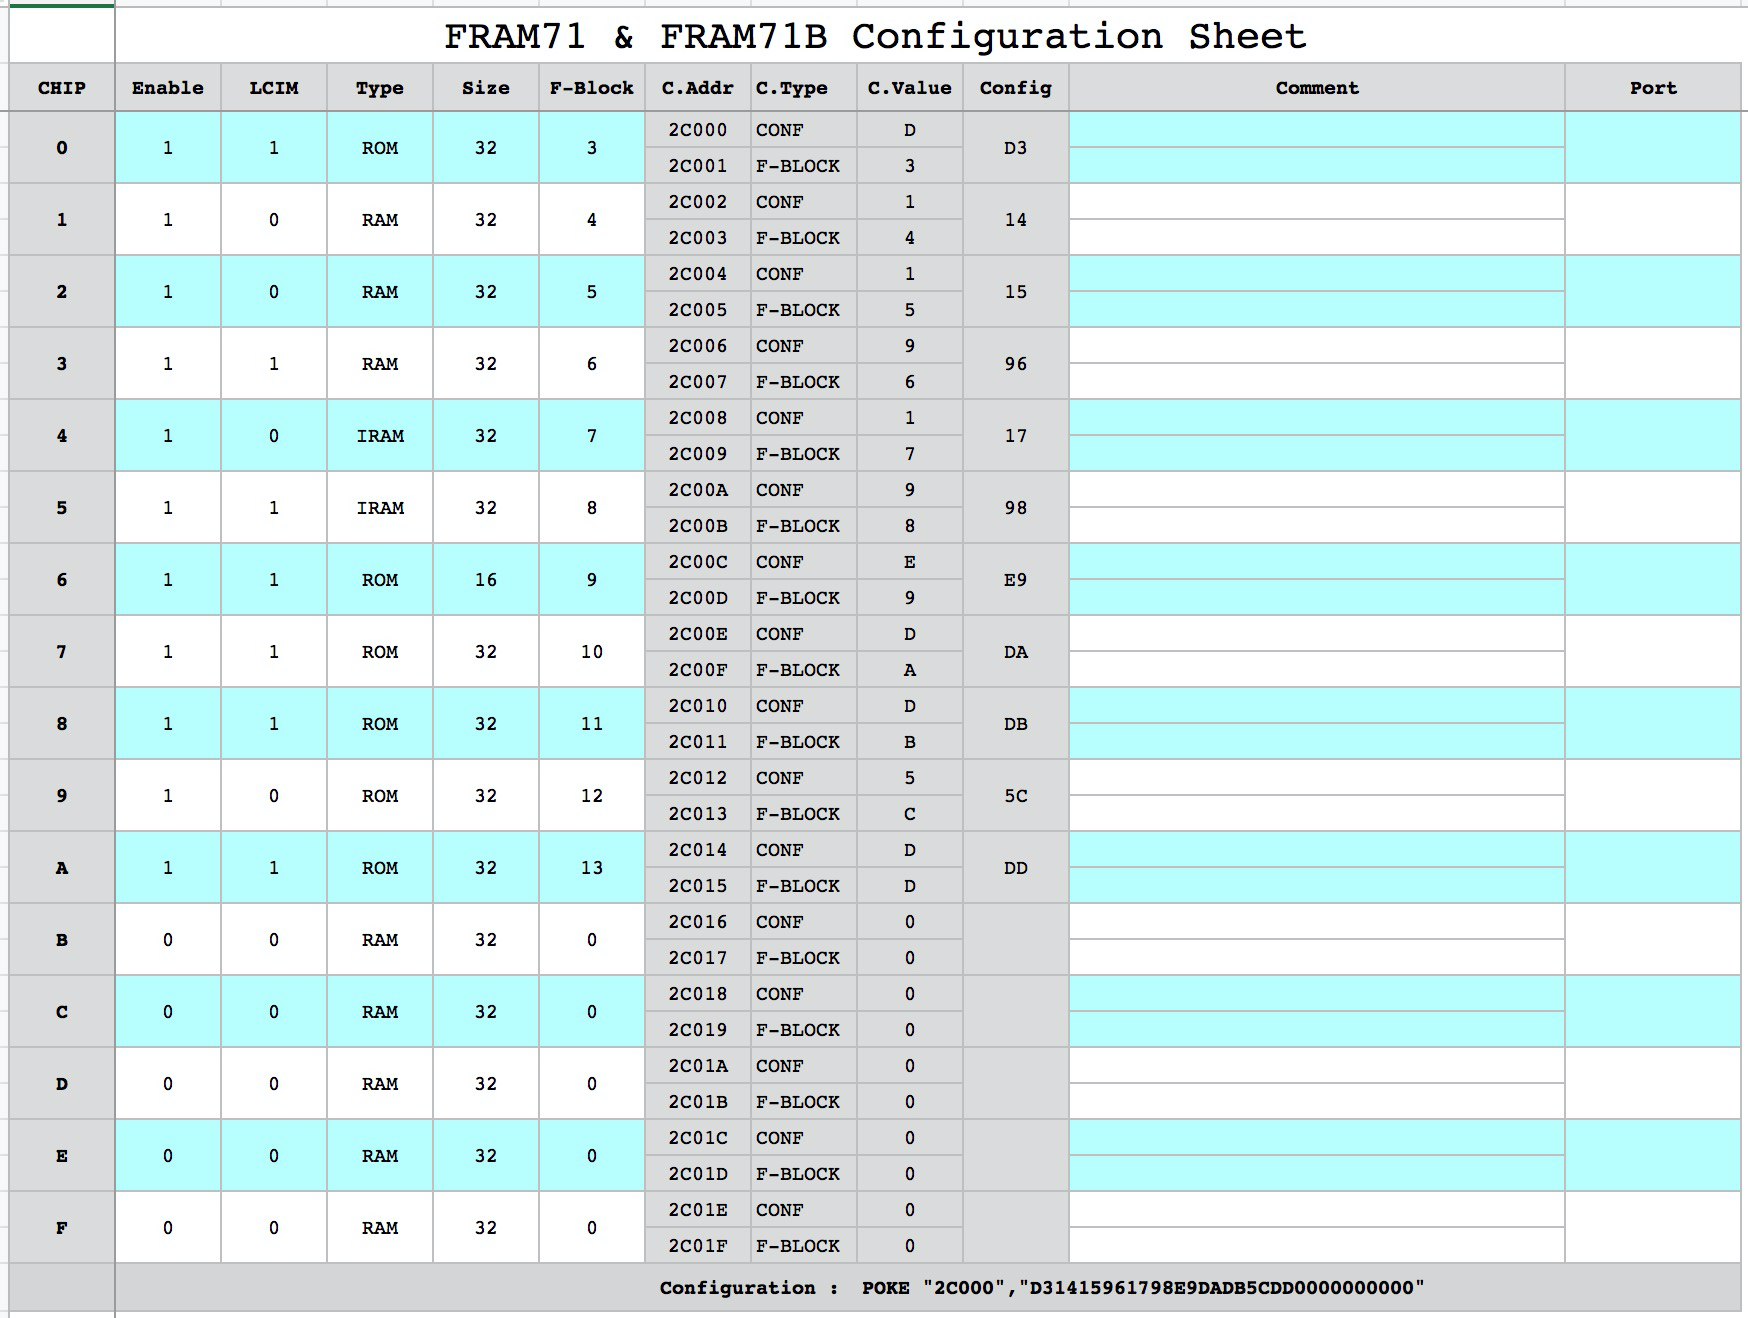 [Image: FRAM71B_Configurator_20210129B_sample_excel.jpg]